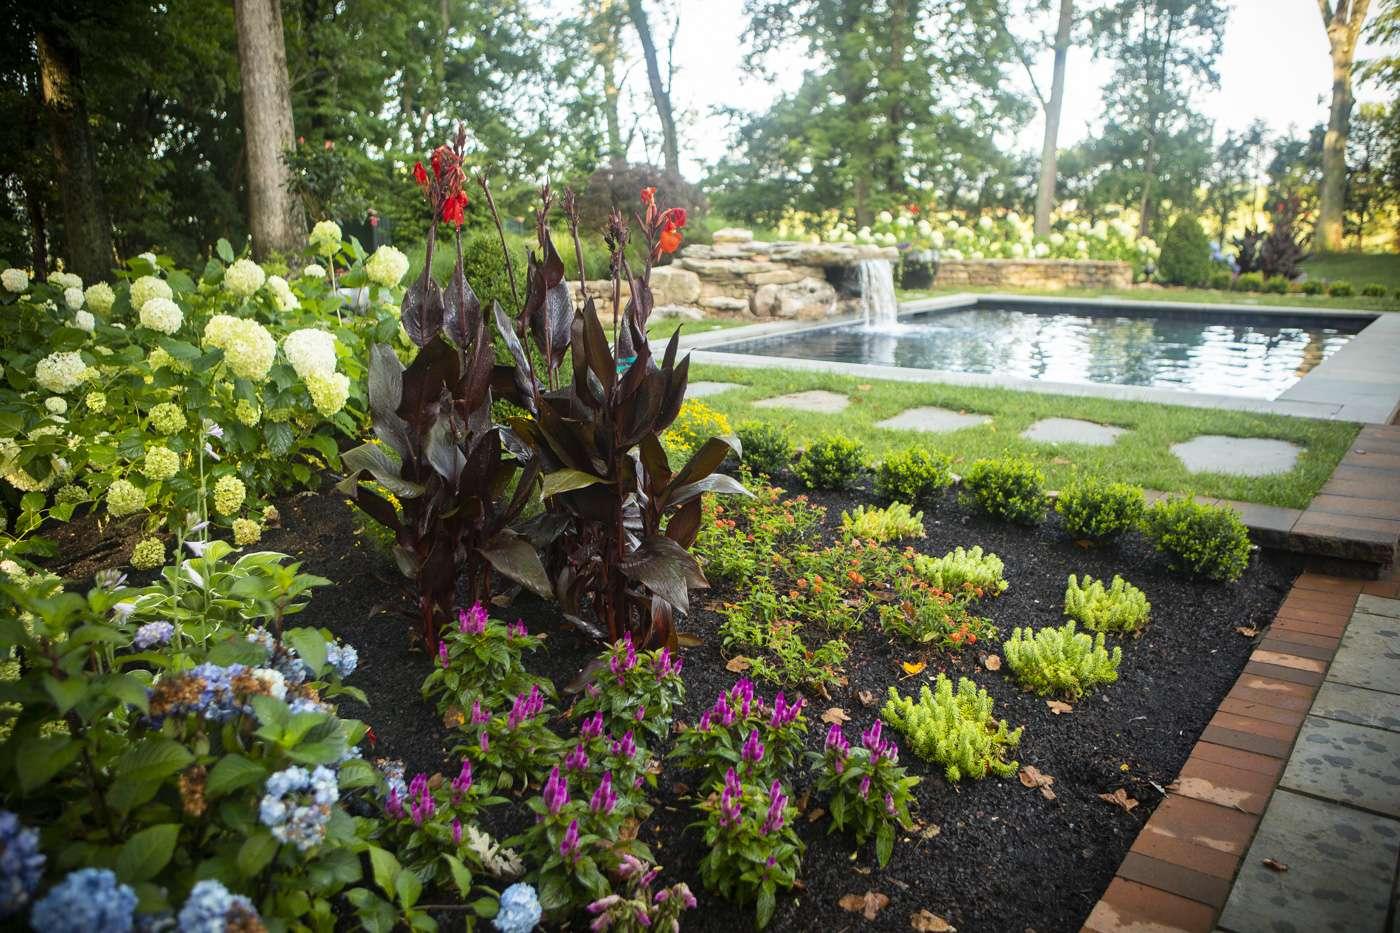 Virginia Flower Planting Schedule: When to Plant Annuals, Perennials, & Bulbs